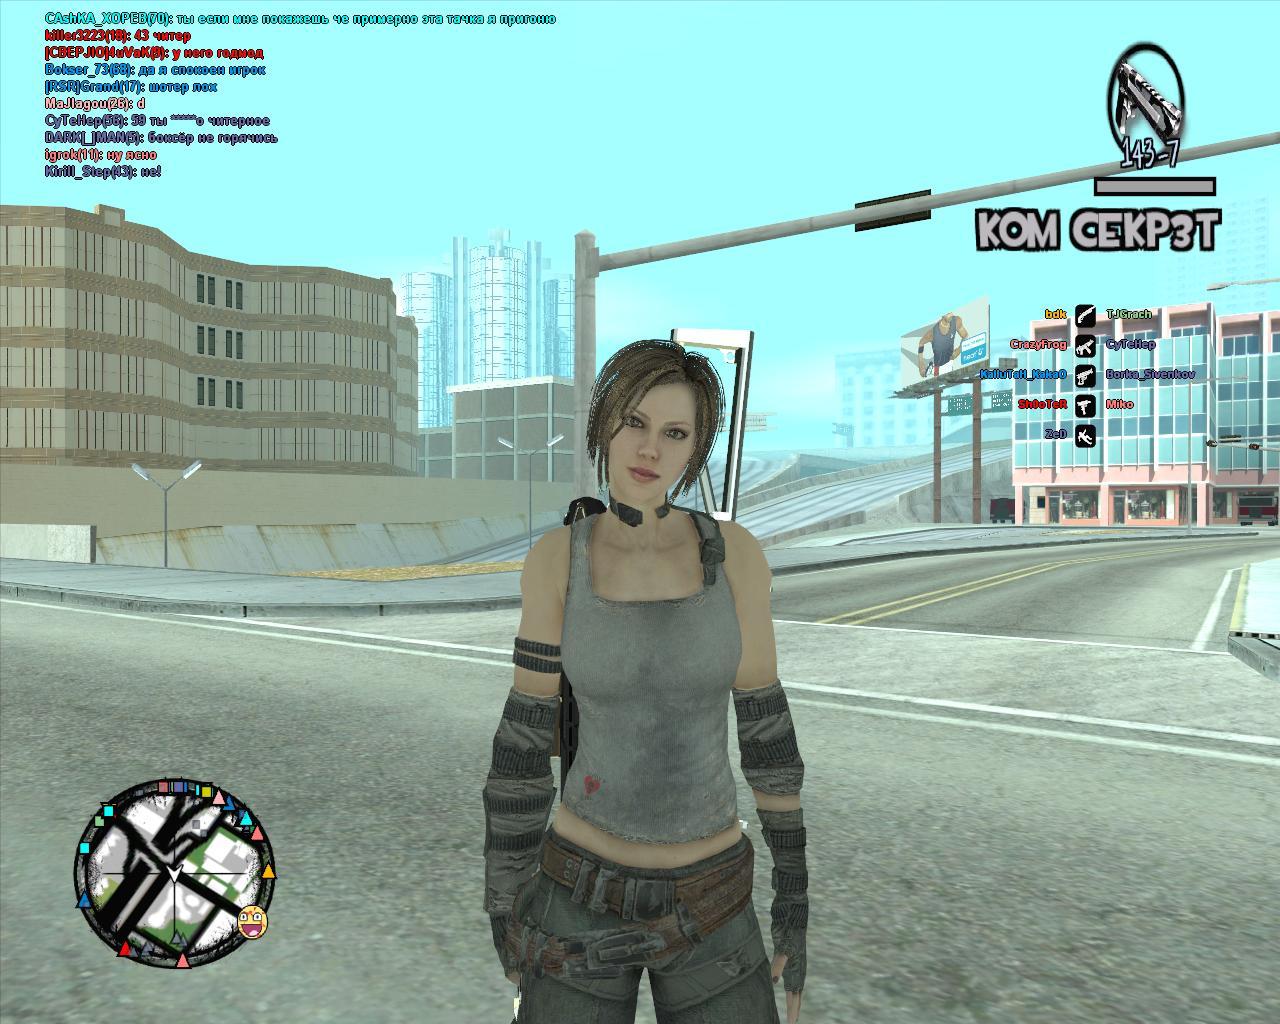 gta_sa 2011-04-06 17-19-55-67.jpg - Grand Theft Auto: San Andreas